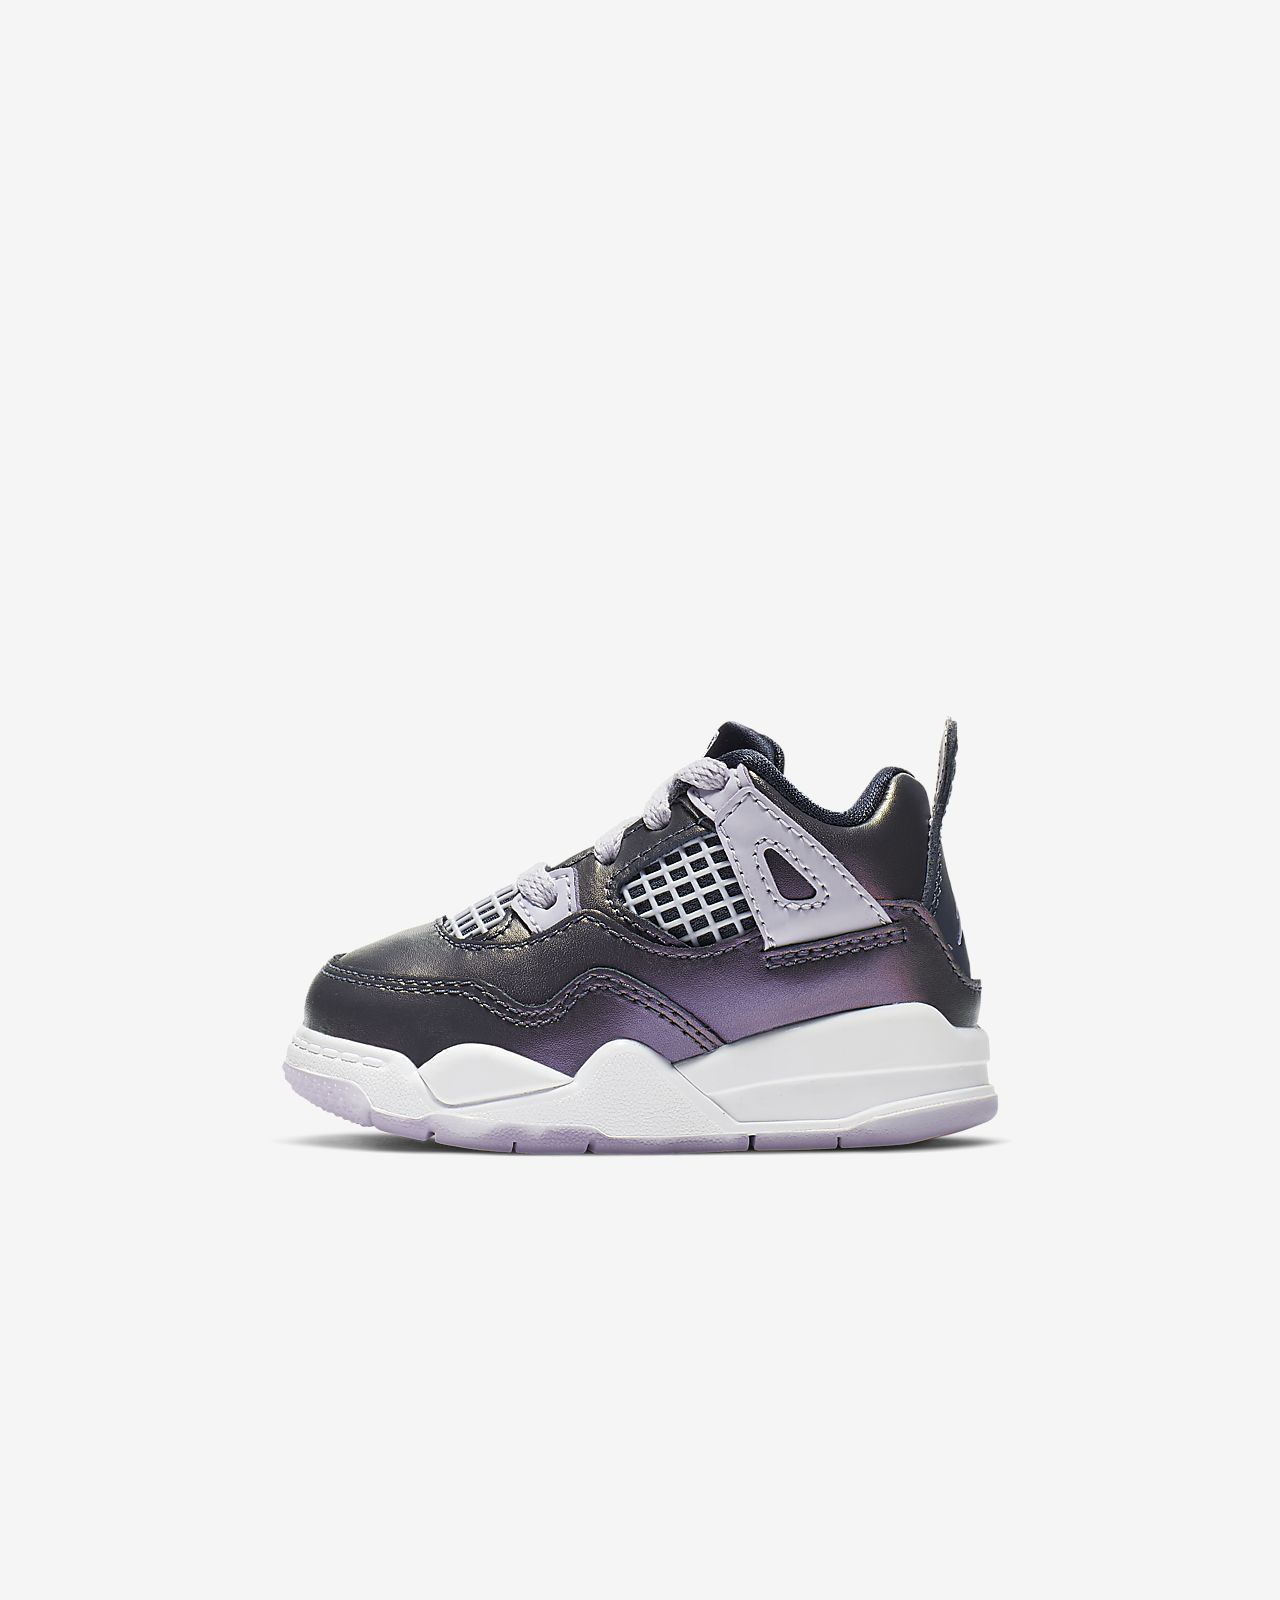 87f4fc29bdba Jordan 4 Retro SE Baby Toddler Shoe. Nike.com